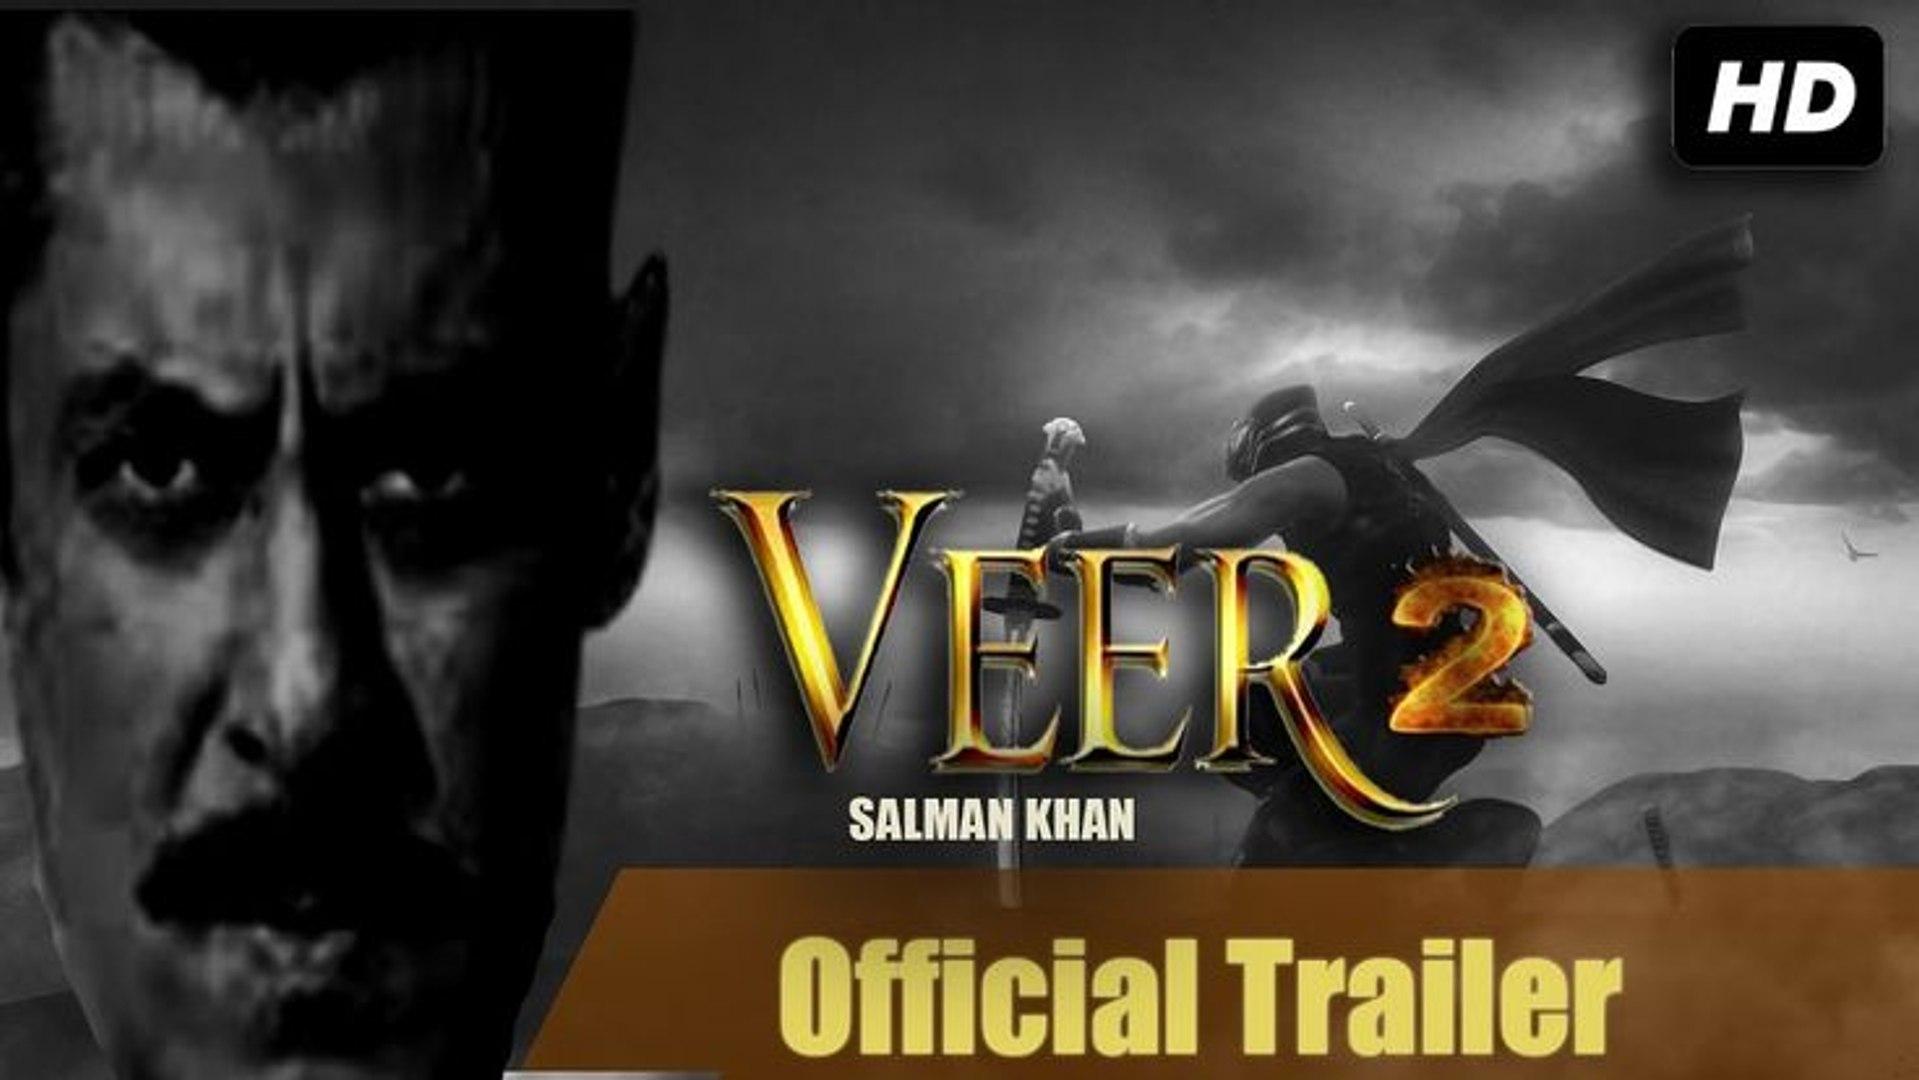 Veer 2 trailer 2020 salman khan full movie in hindi trailer -वीर 2 ट्रेलर all songs -fanmade trailer